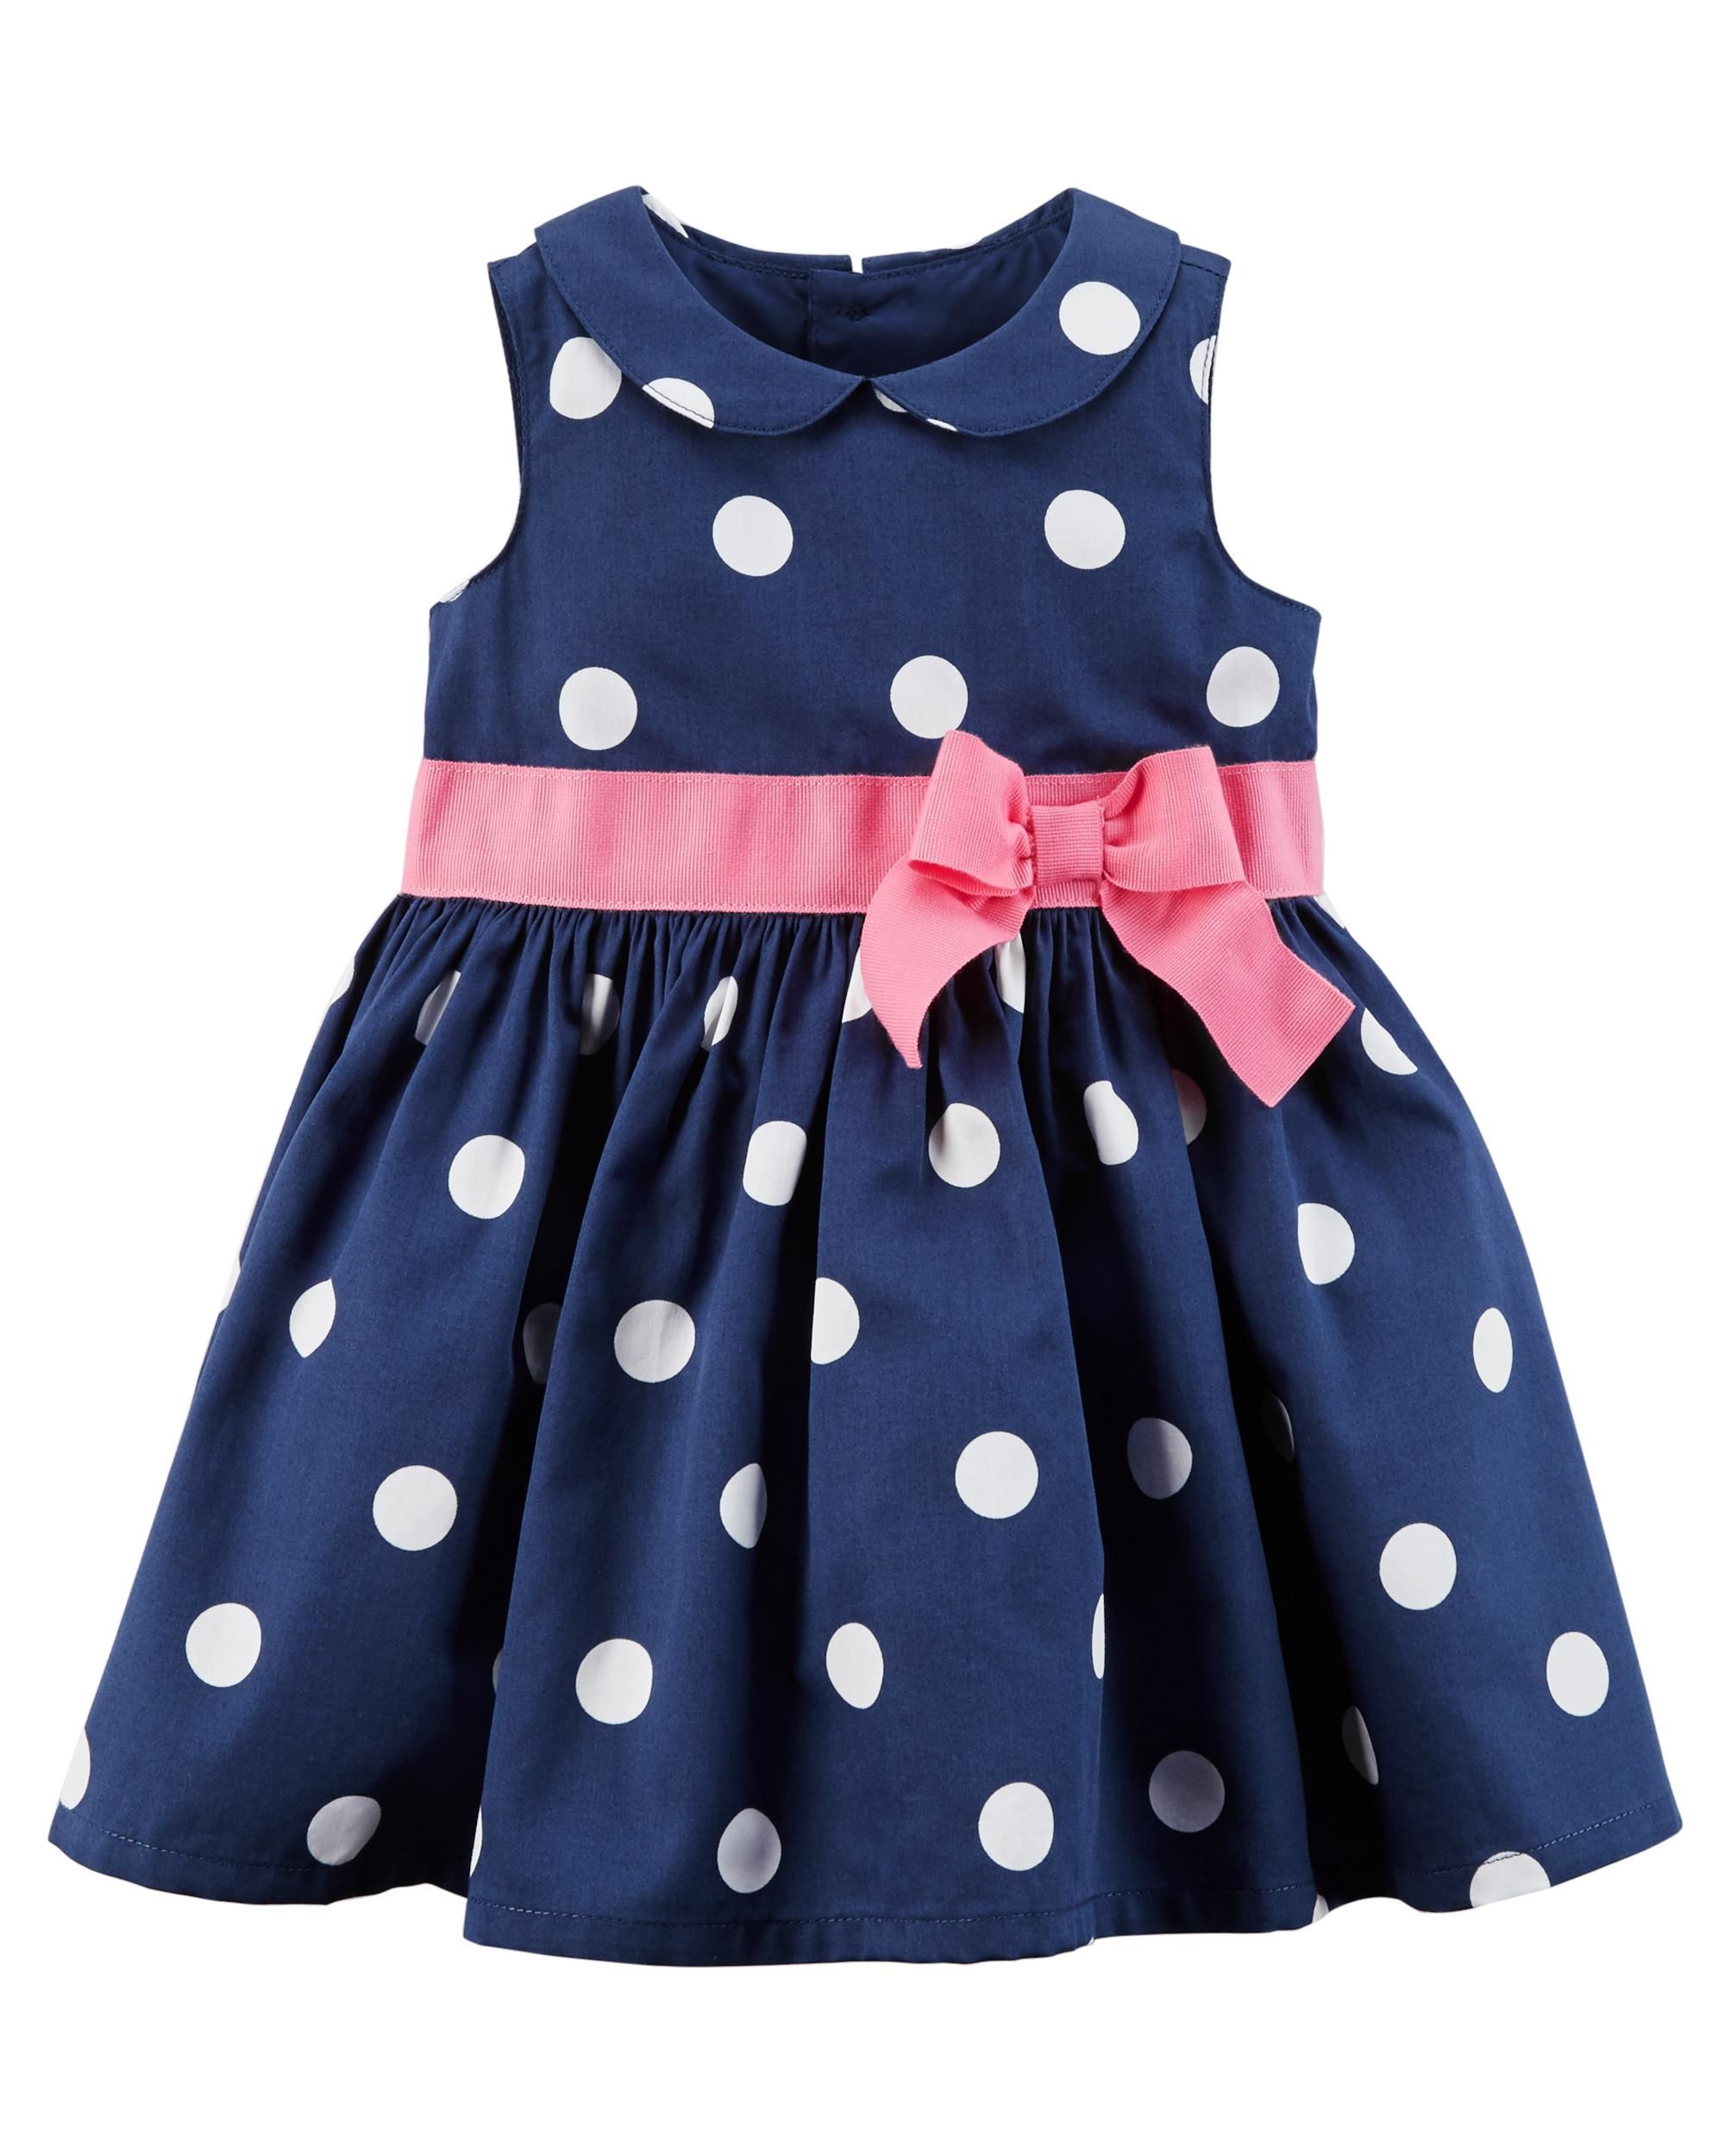 b6d00c56dfb Polka Dot Sateen Dress   Adi Rose Twinkle Toes   Carters baby girl ...